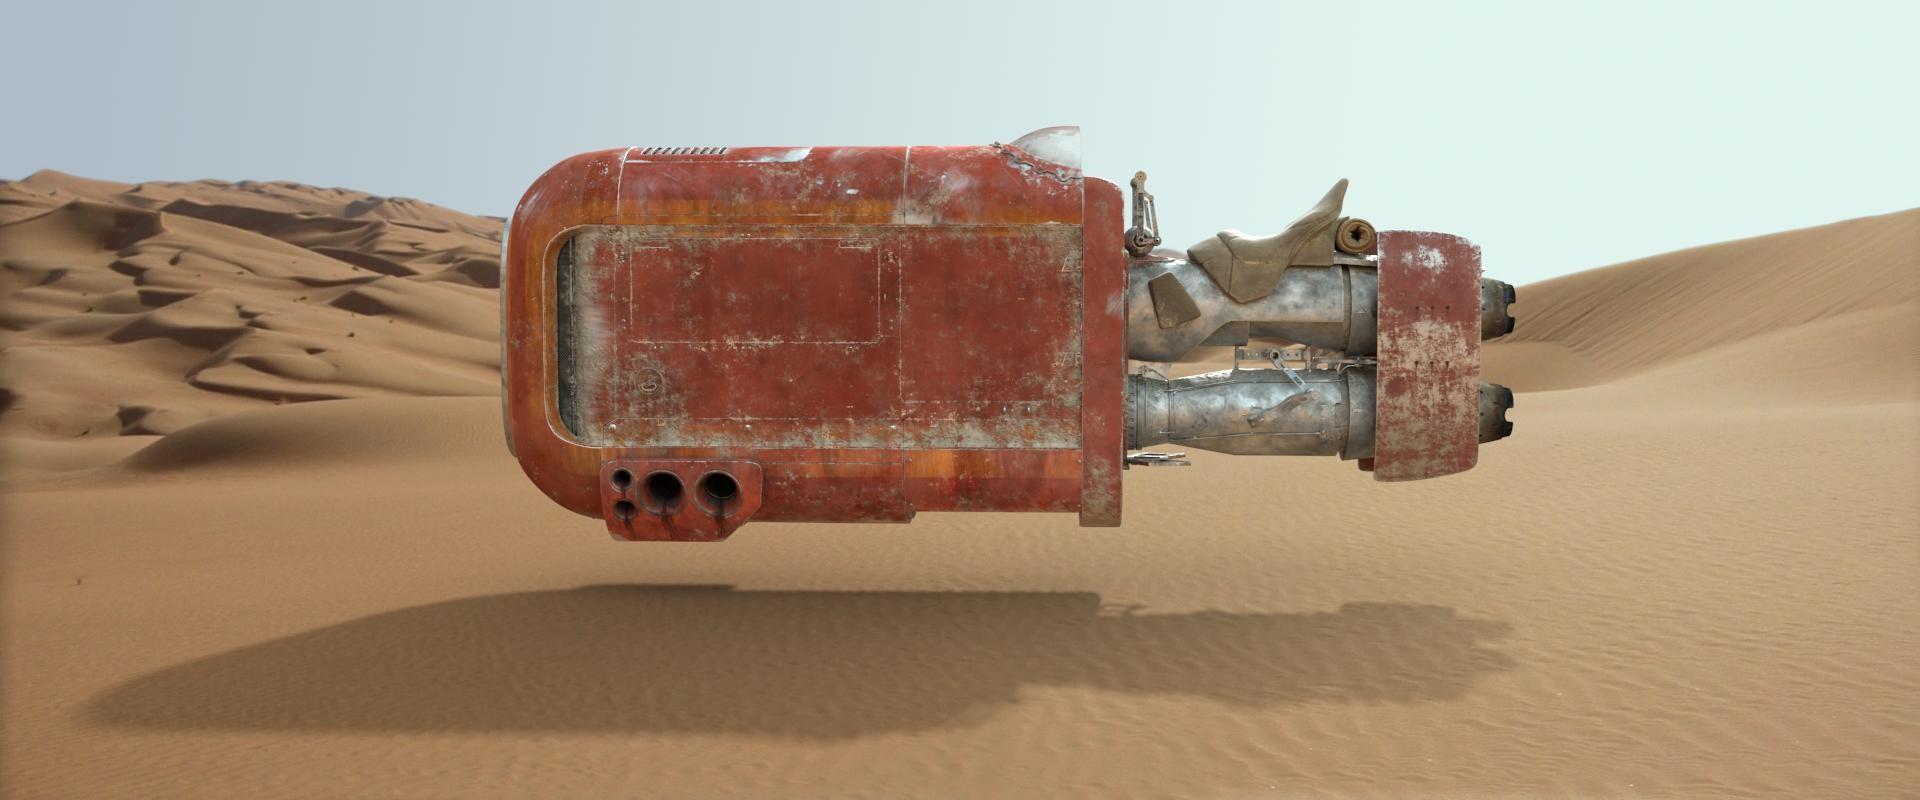 Rey's Speeder MOC-56363 Star Wars Designed By JohndieRocks With 168 Pieces